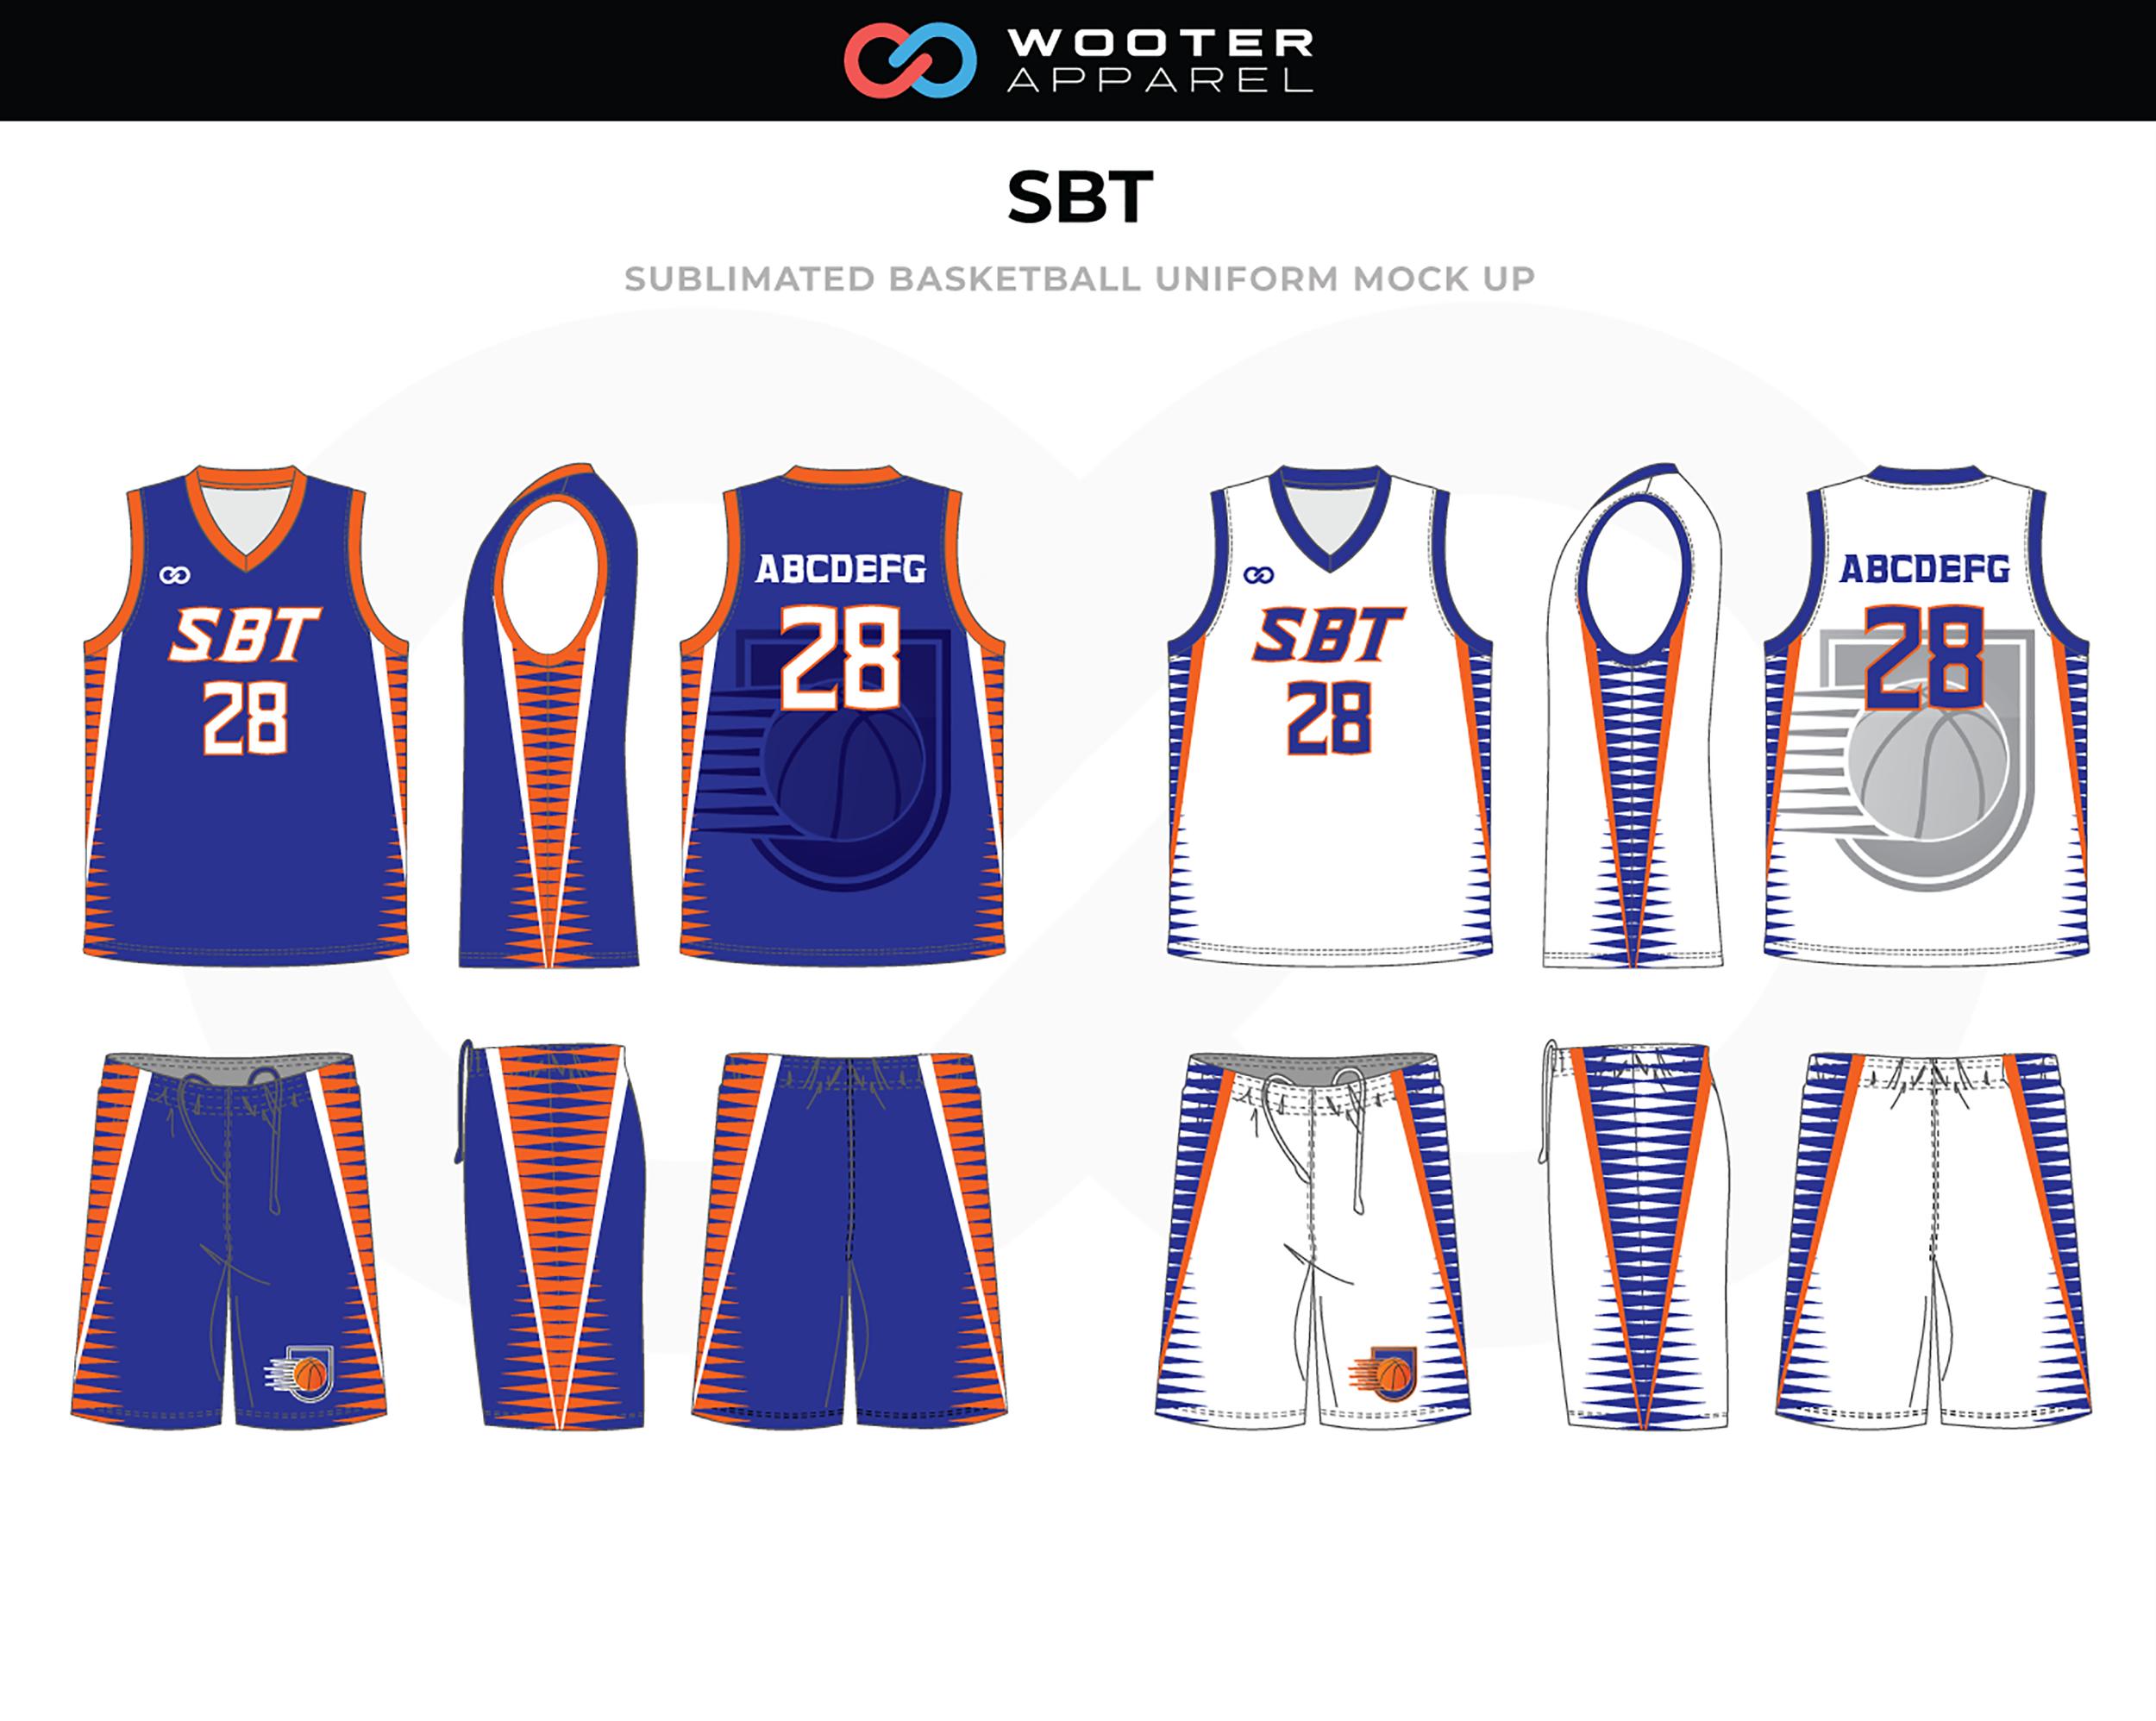 SBT-Basketball-Sublimated-Basketball-Uniform-Mock-Up.png